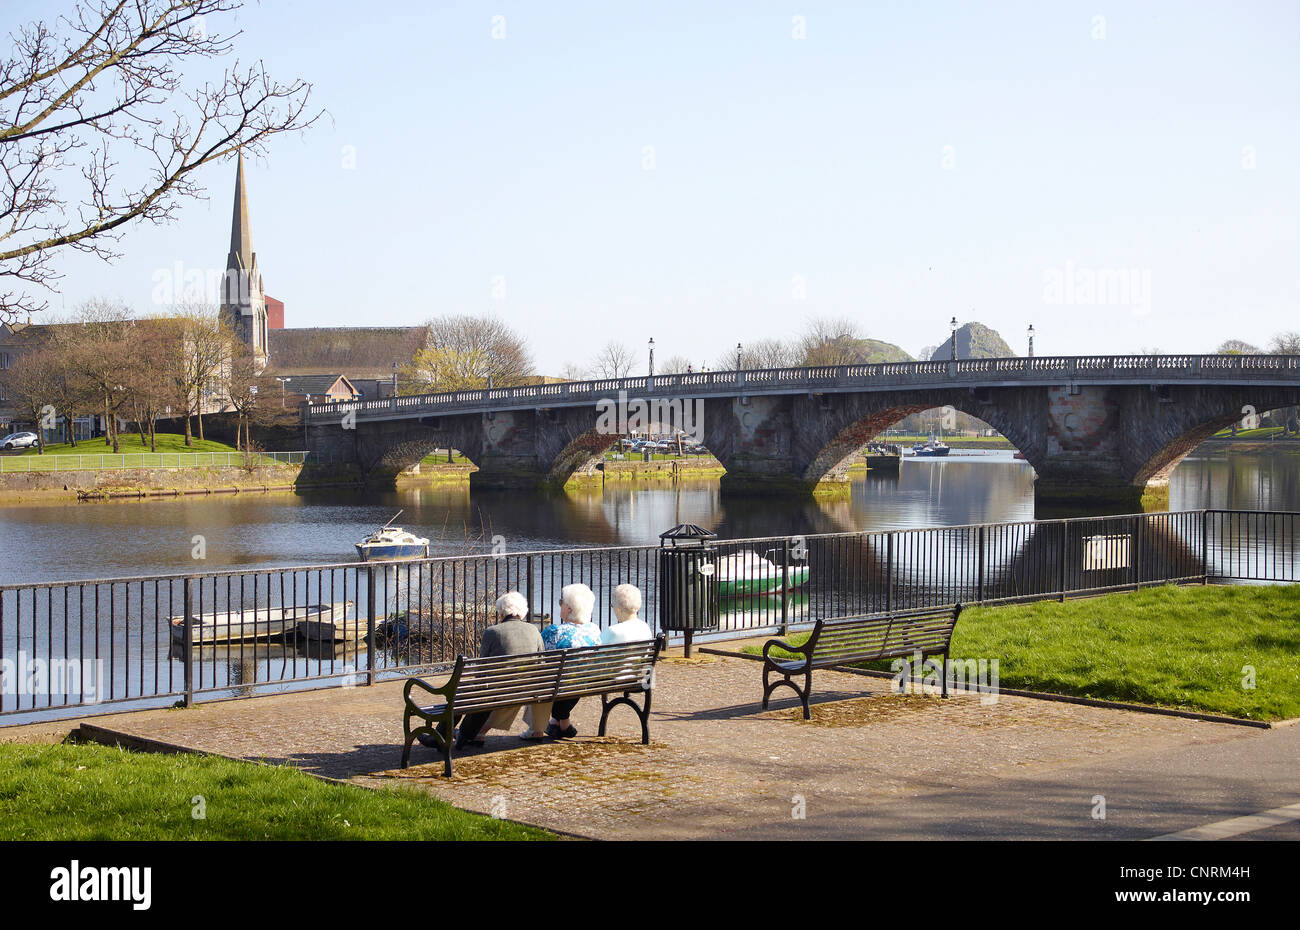 The River leven and old Dumbarton Bridge, Dumbarton, Scotland - Stock Image